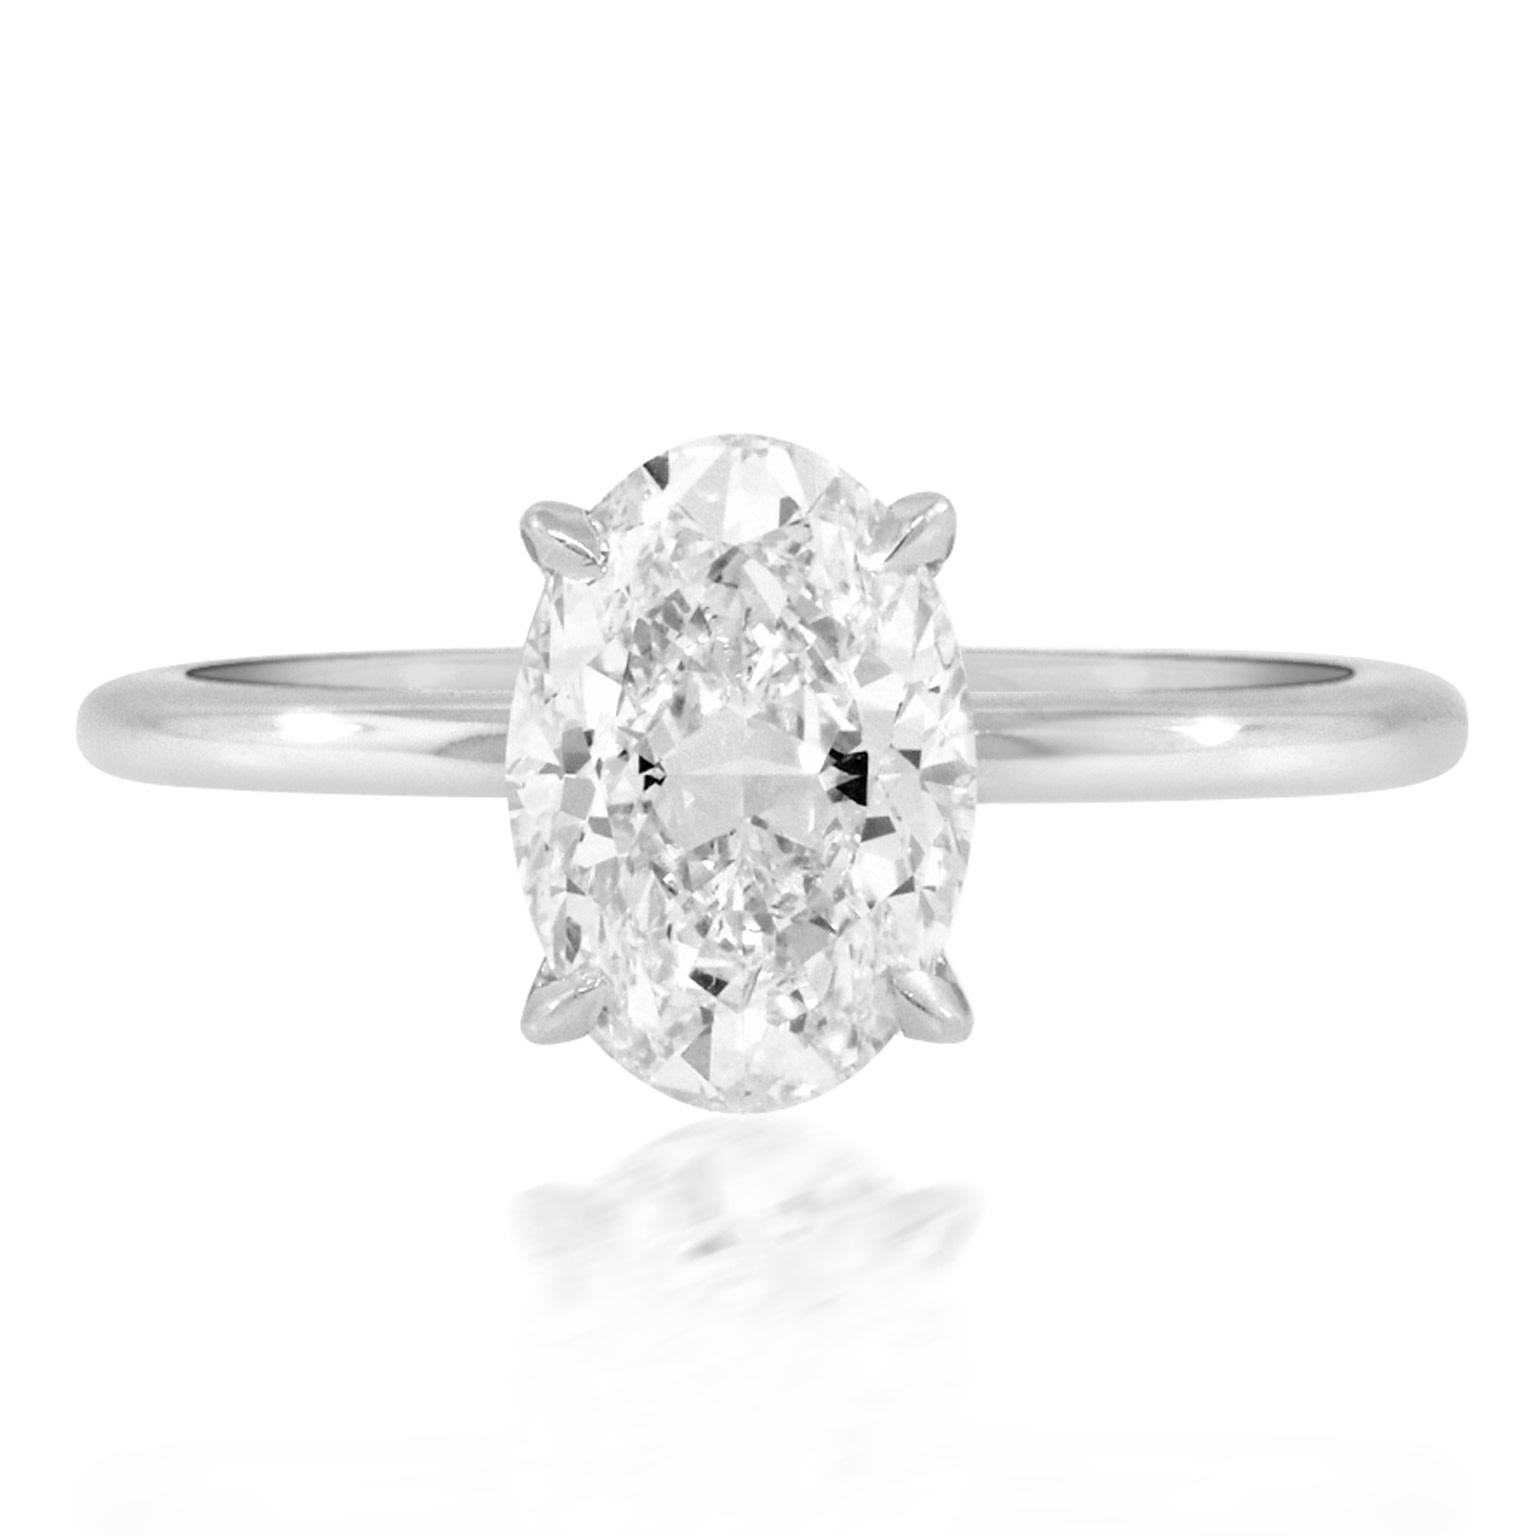 Trabert Goldsmiths 1.70ct HSI1 Oval Diamond Platinum Aura Ring